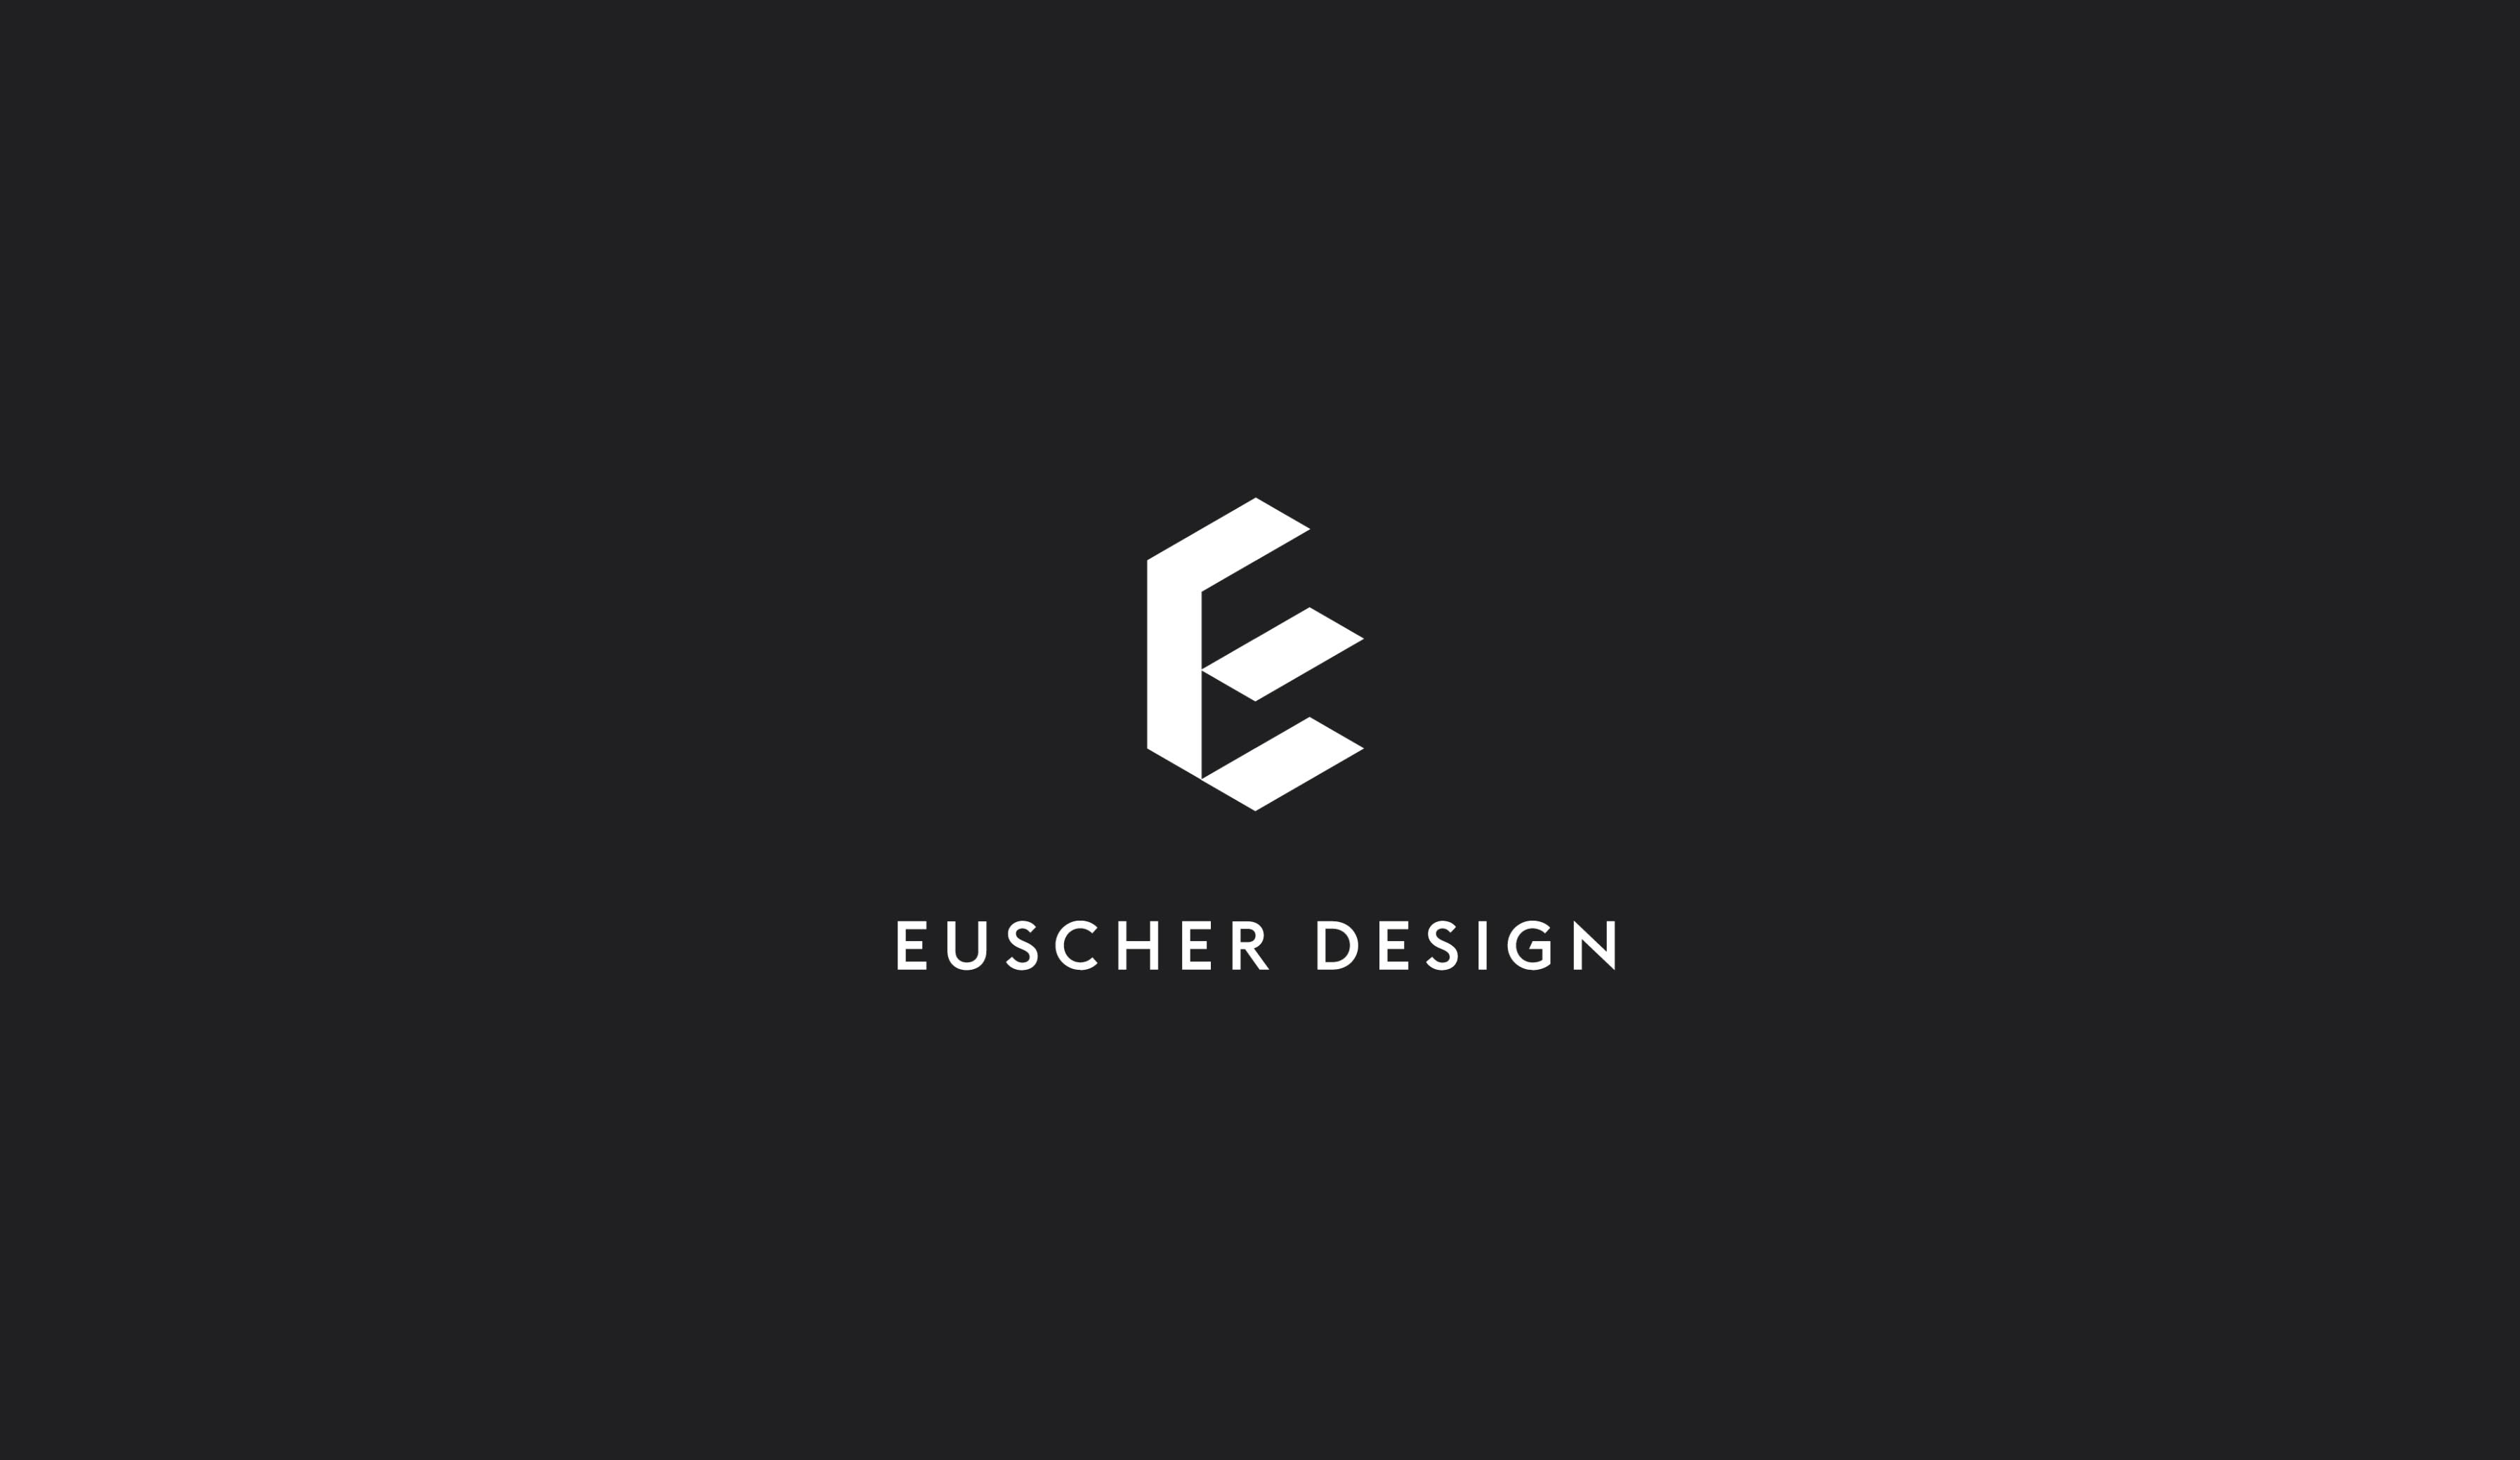 Euscher Design logo design